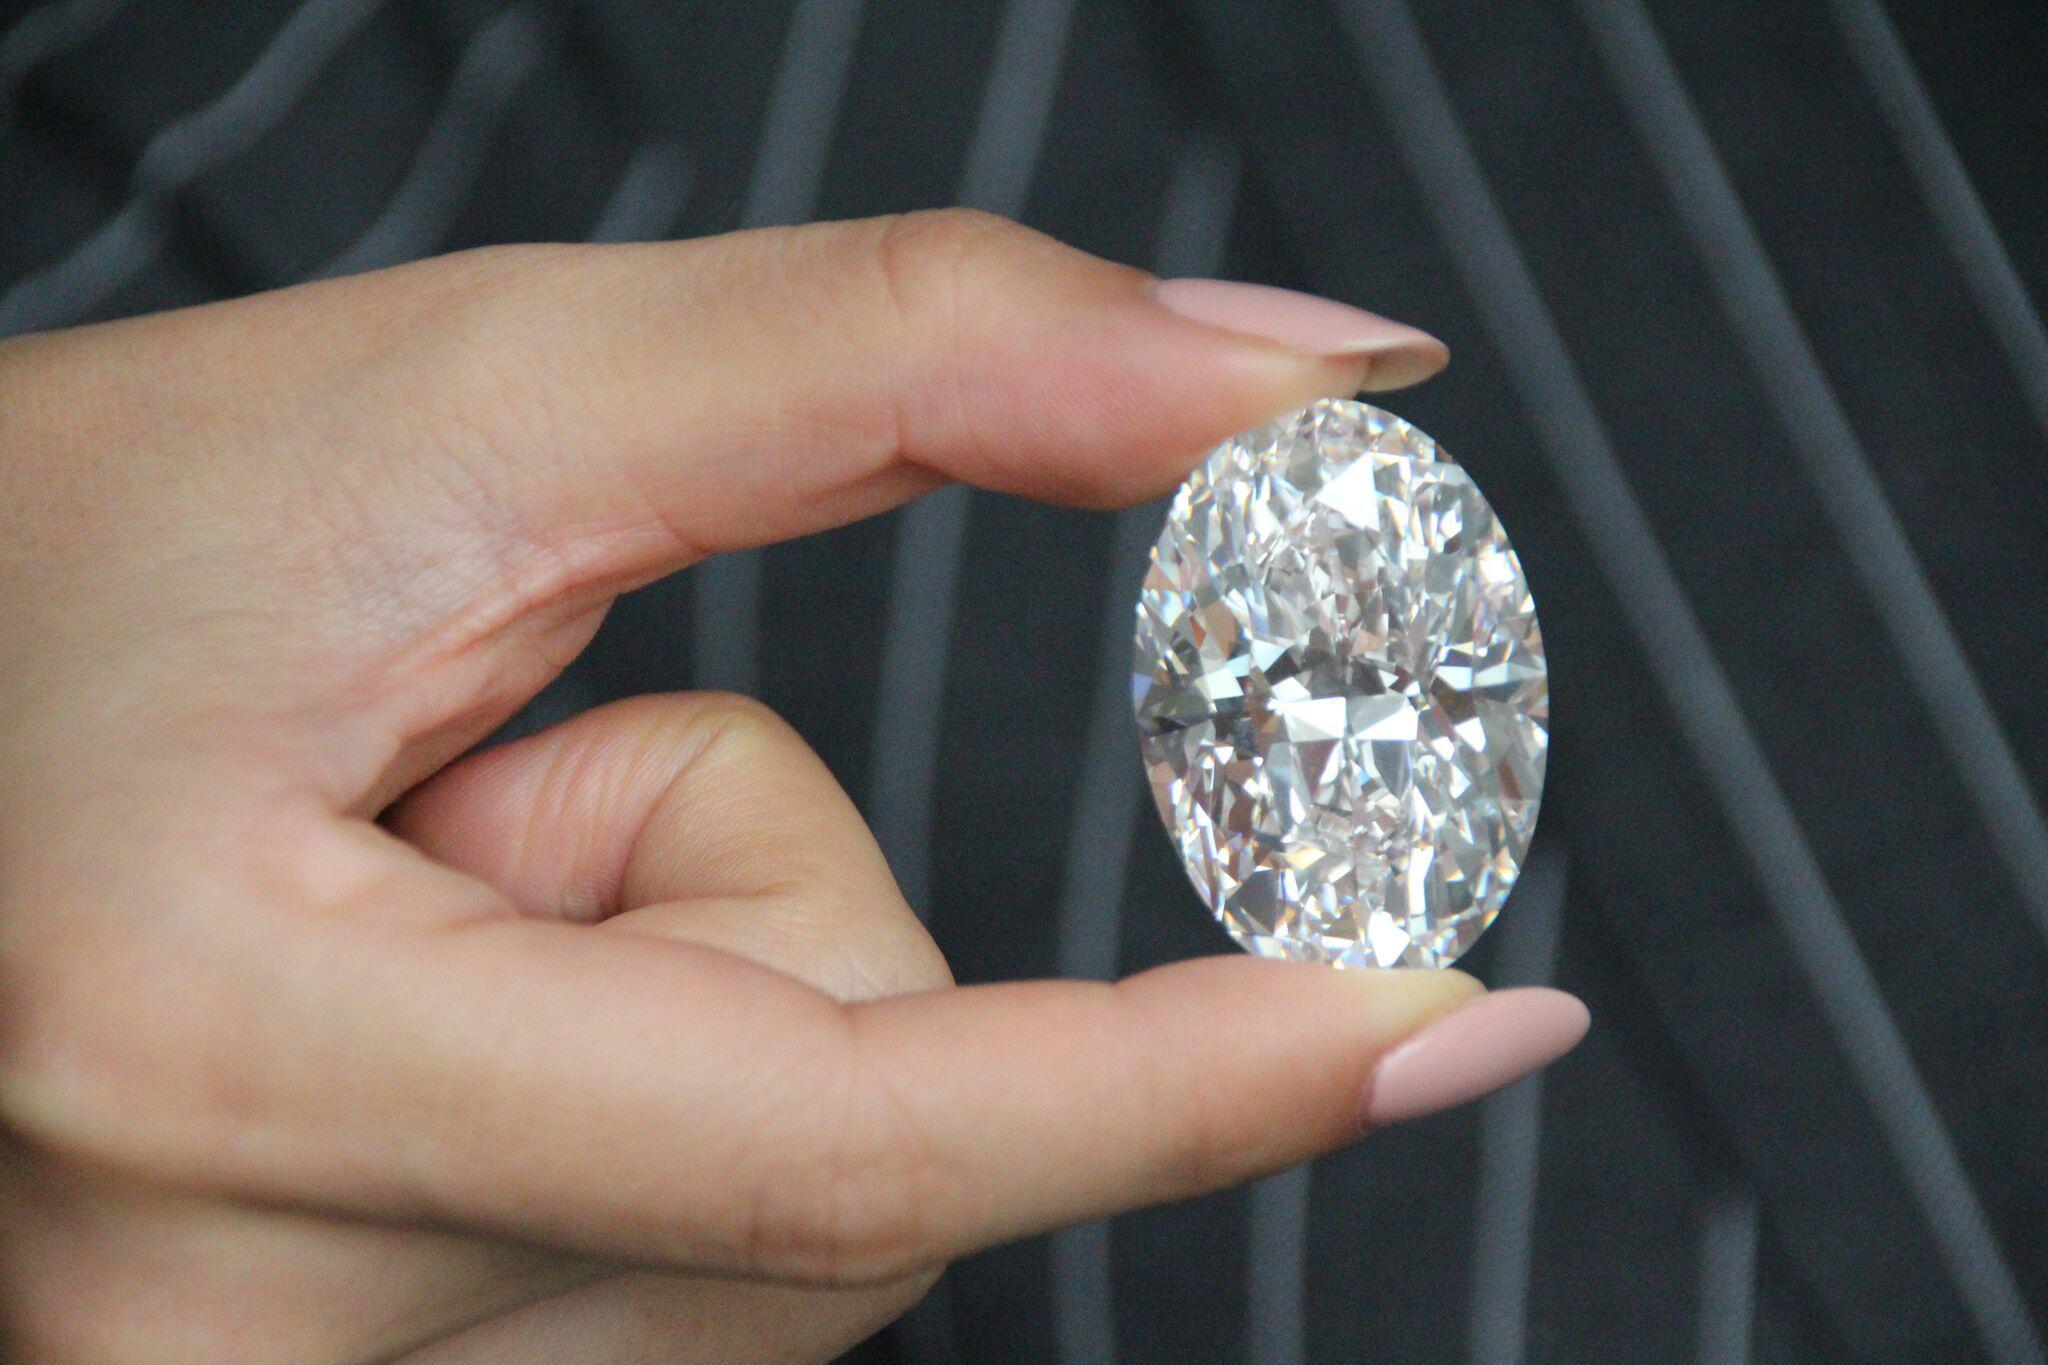 Bild zu Wertvoller Diamant aus Kanada soll in Hongkong versteigert werde